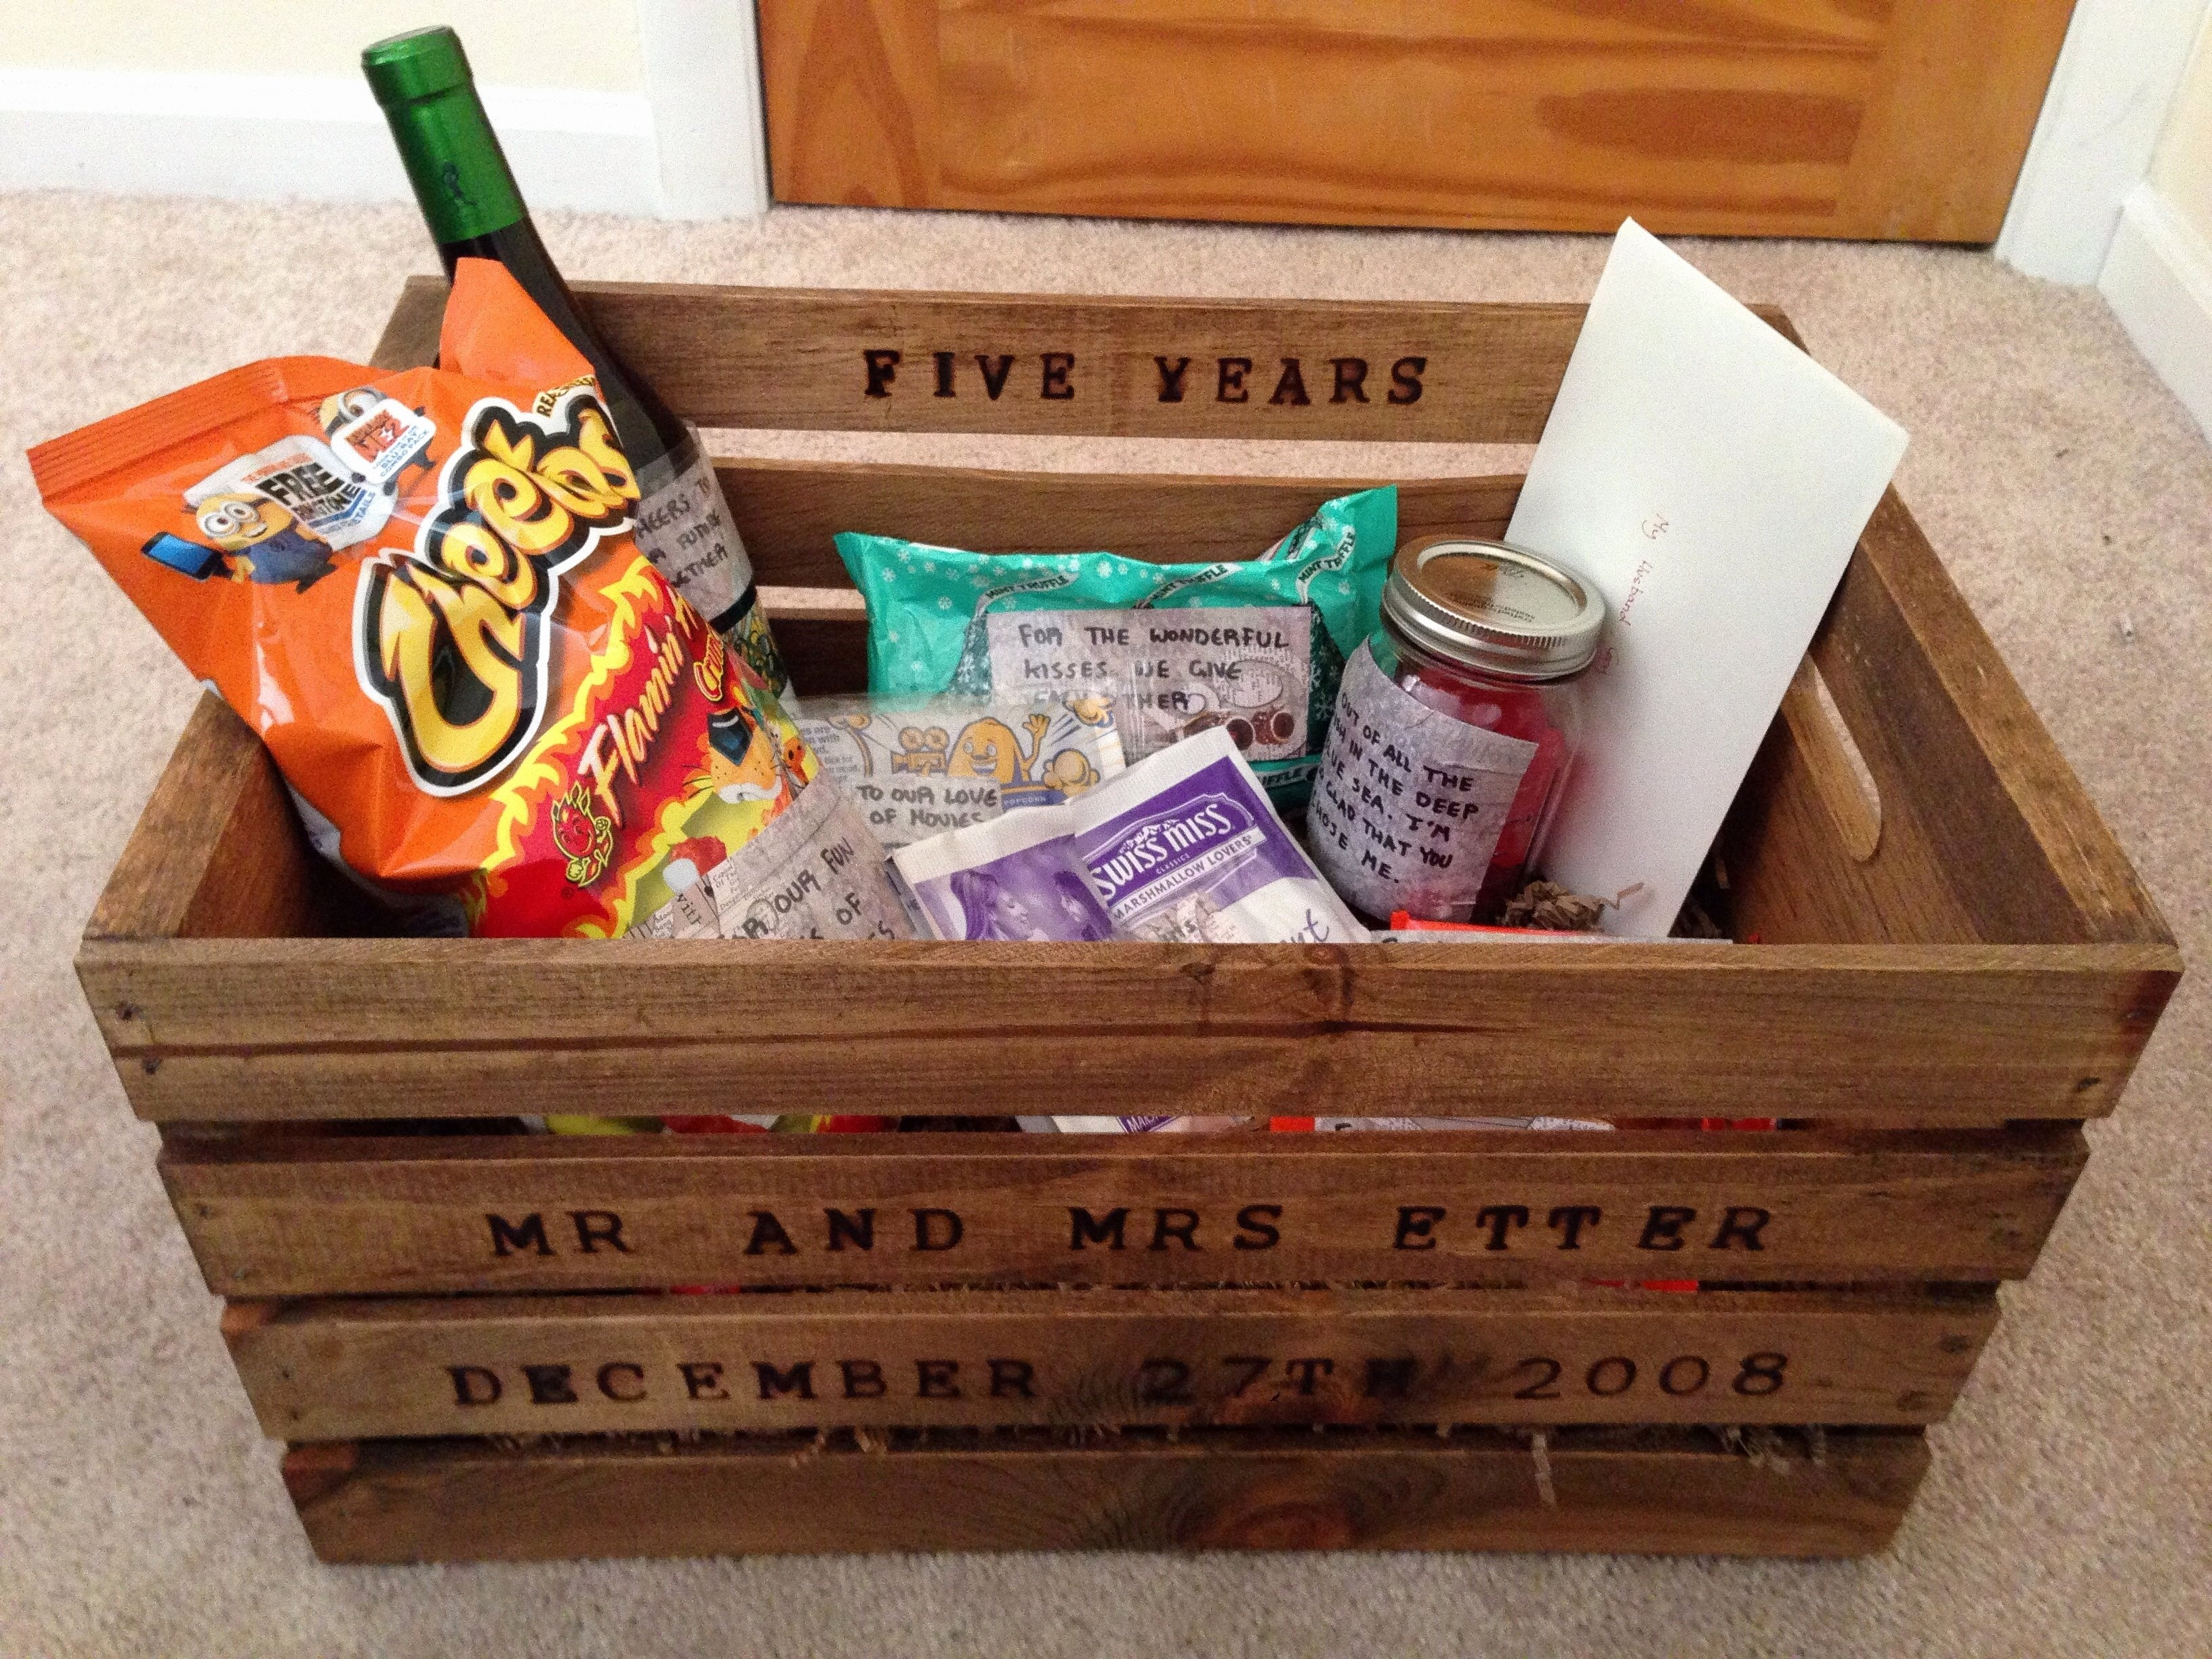 10 Pretty 5 Year Wedding Anniversary Gift Ideas 7th wedding anniversary gifts for him unique 12 5 anniversary gift 4 2020